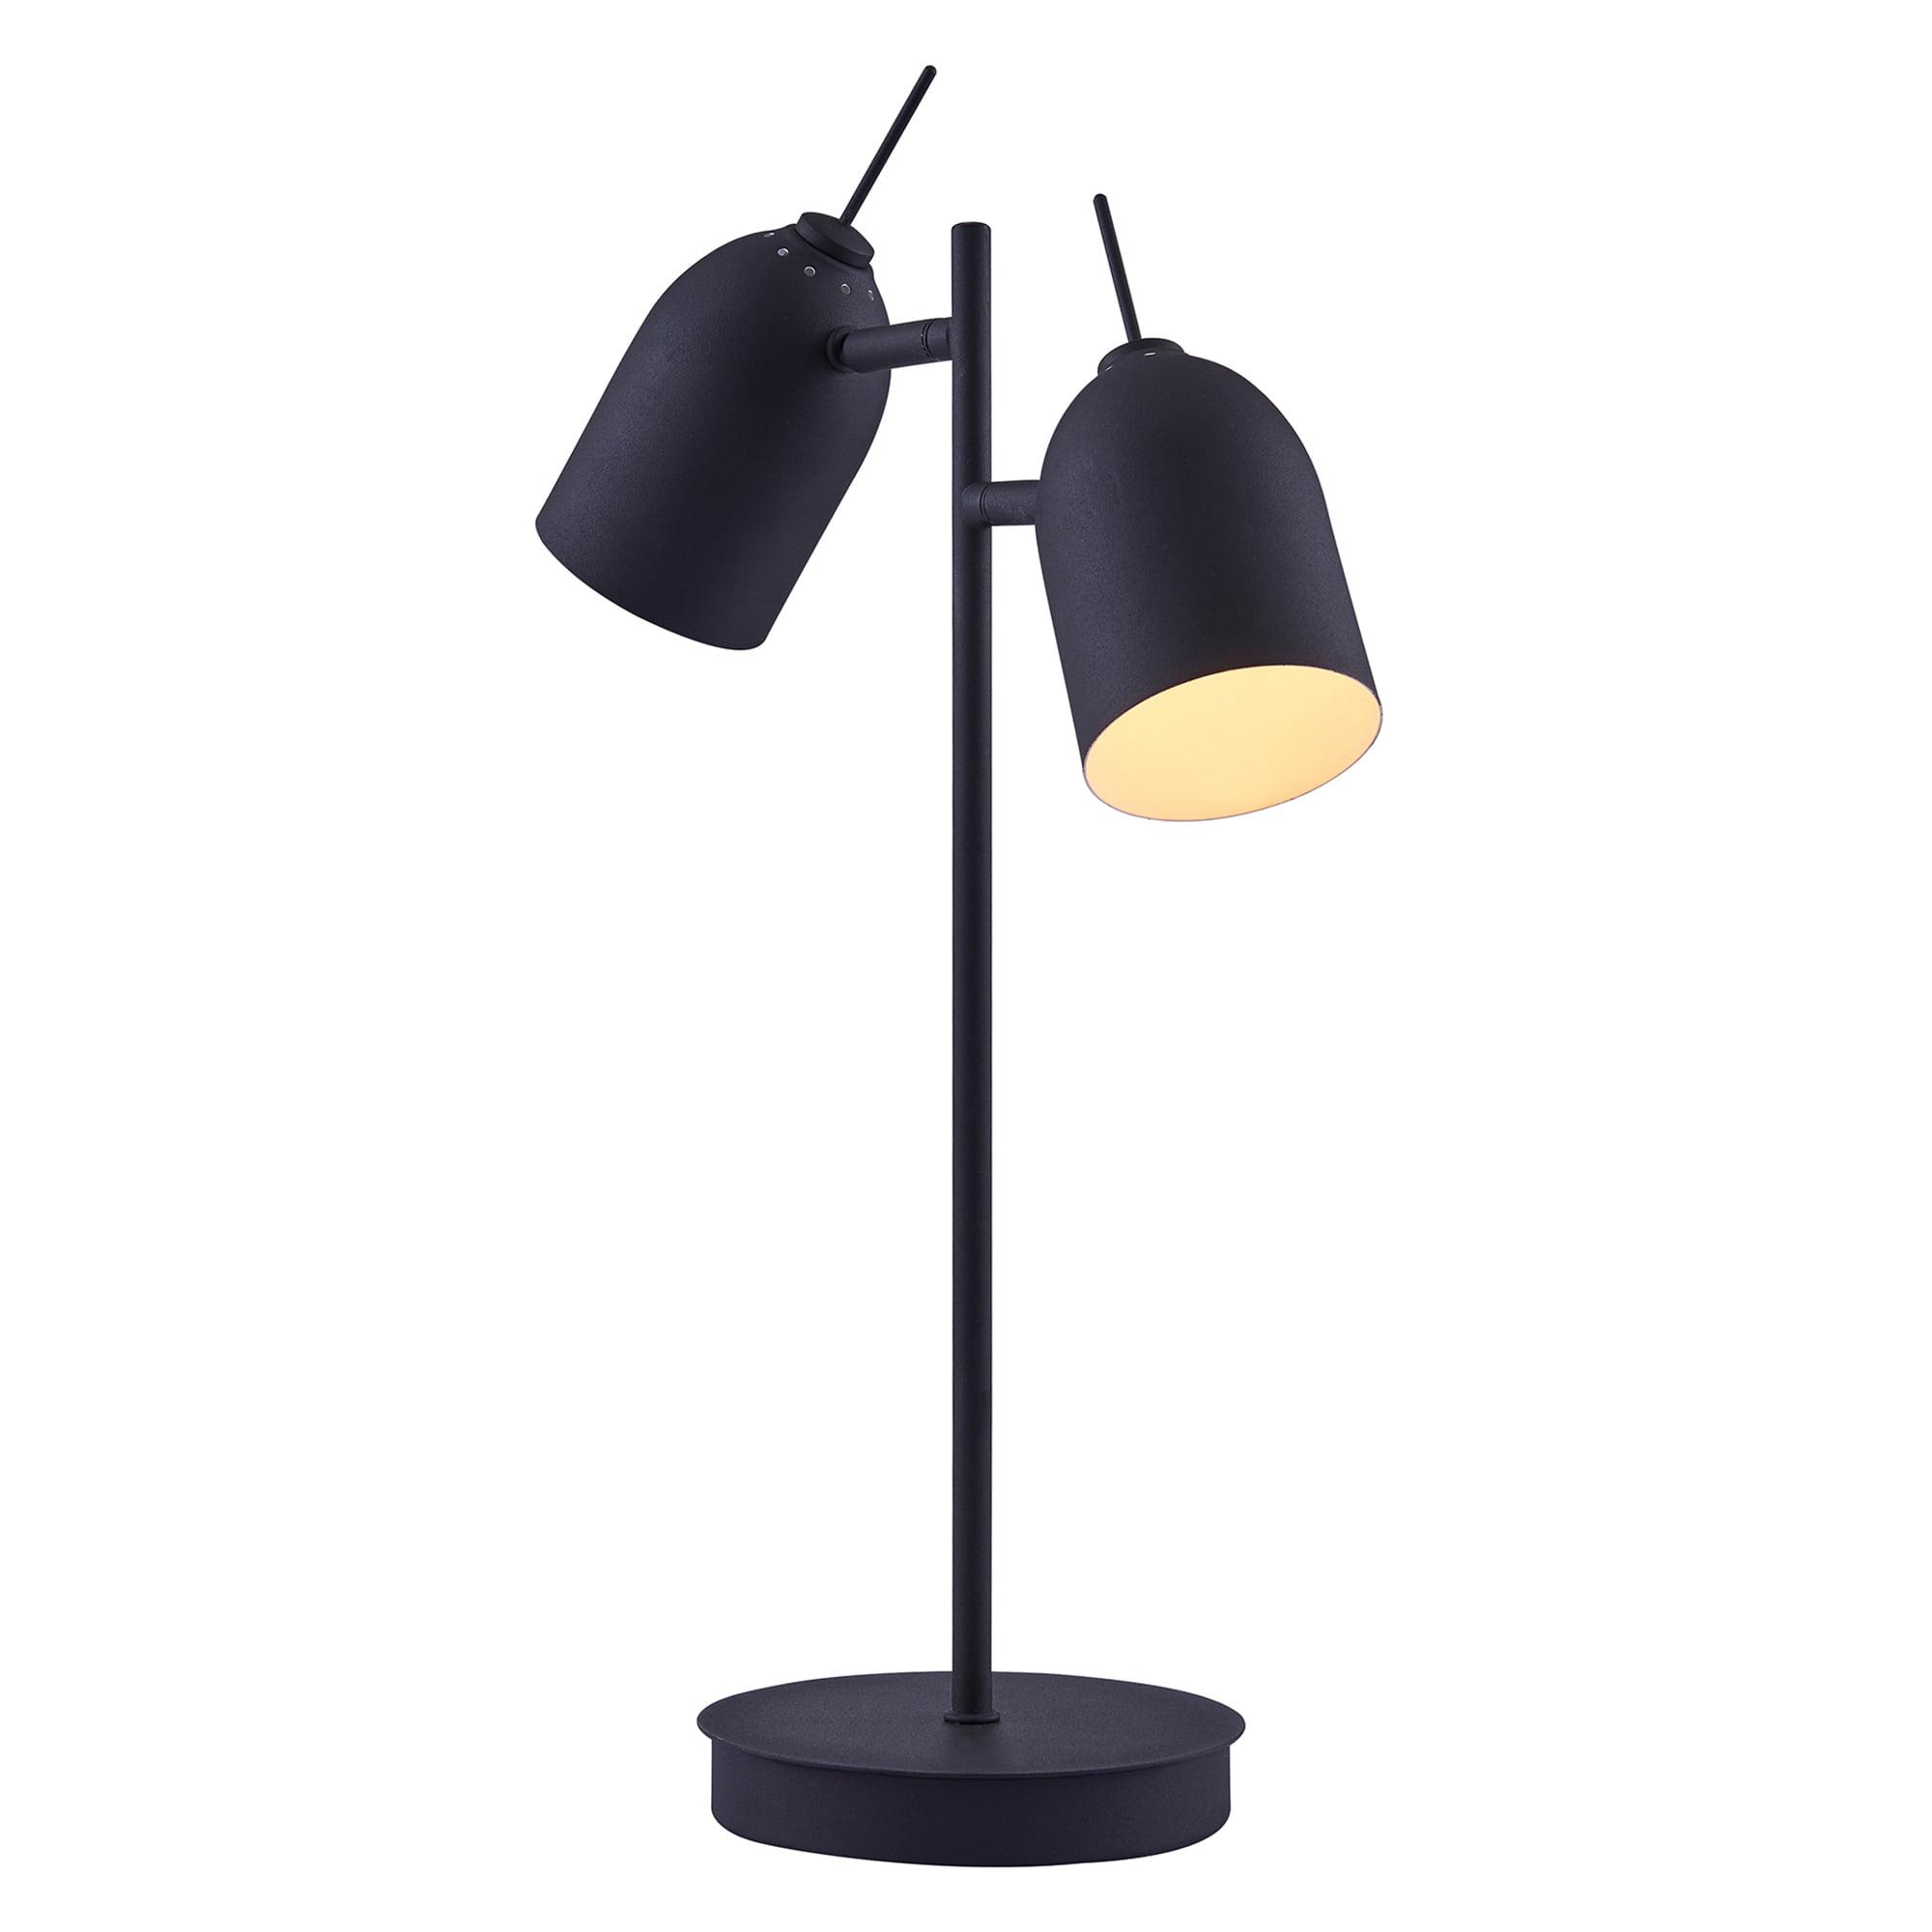 Versanora - Mason Table Lamp With Black Finish Shade